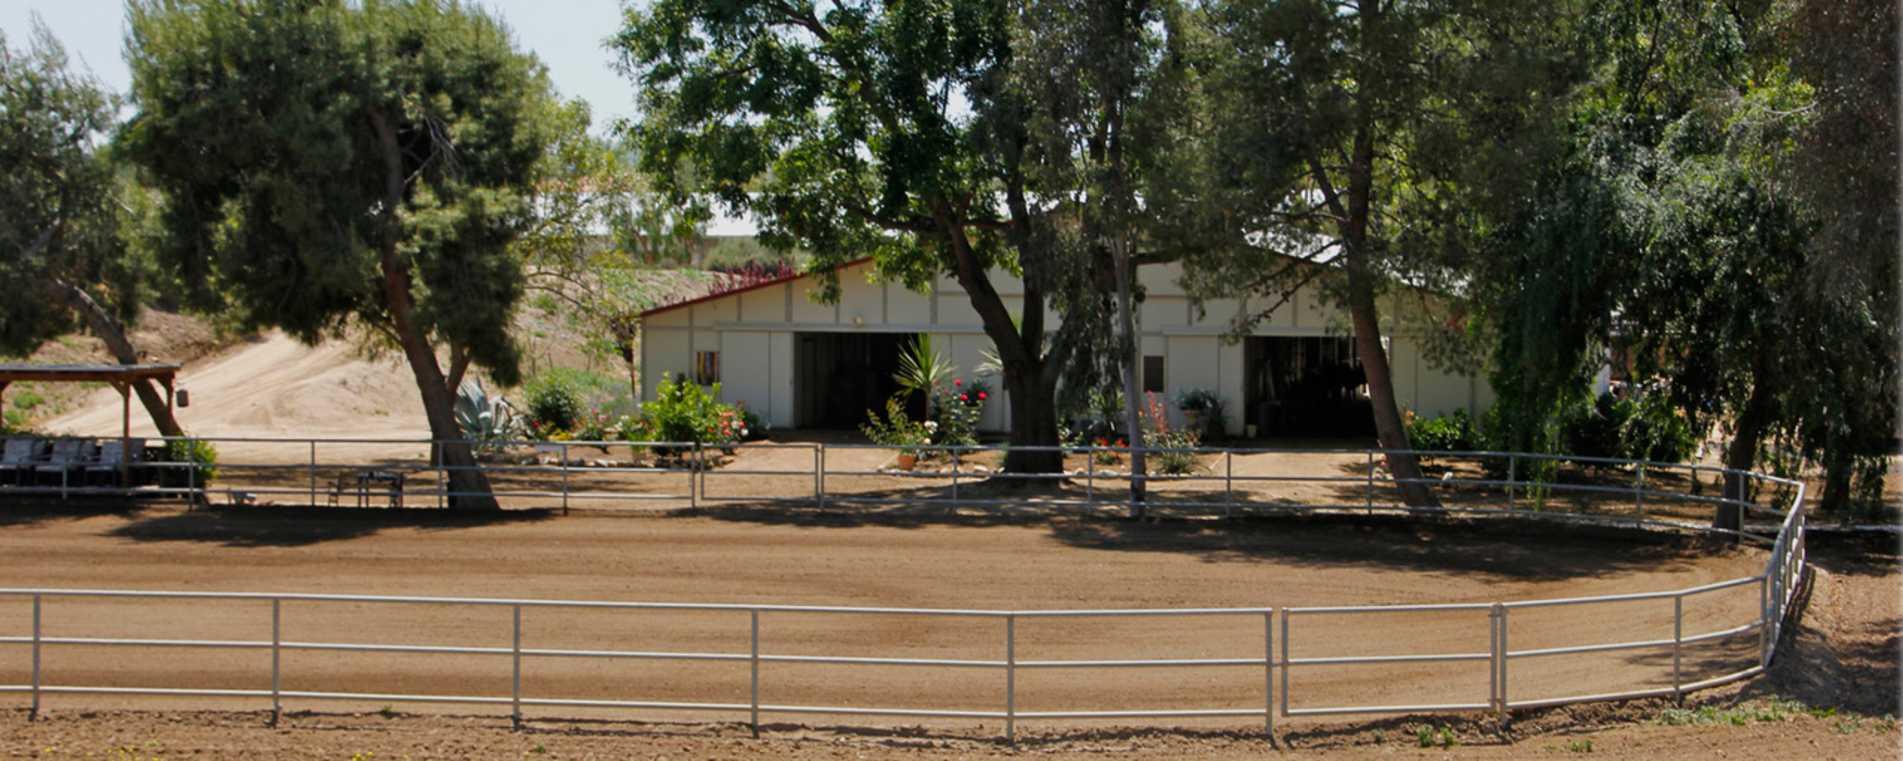 Green Acres Ranch Inc. - Temecula